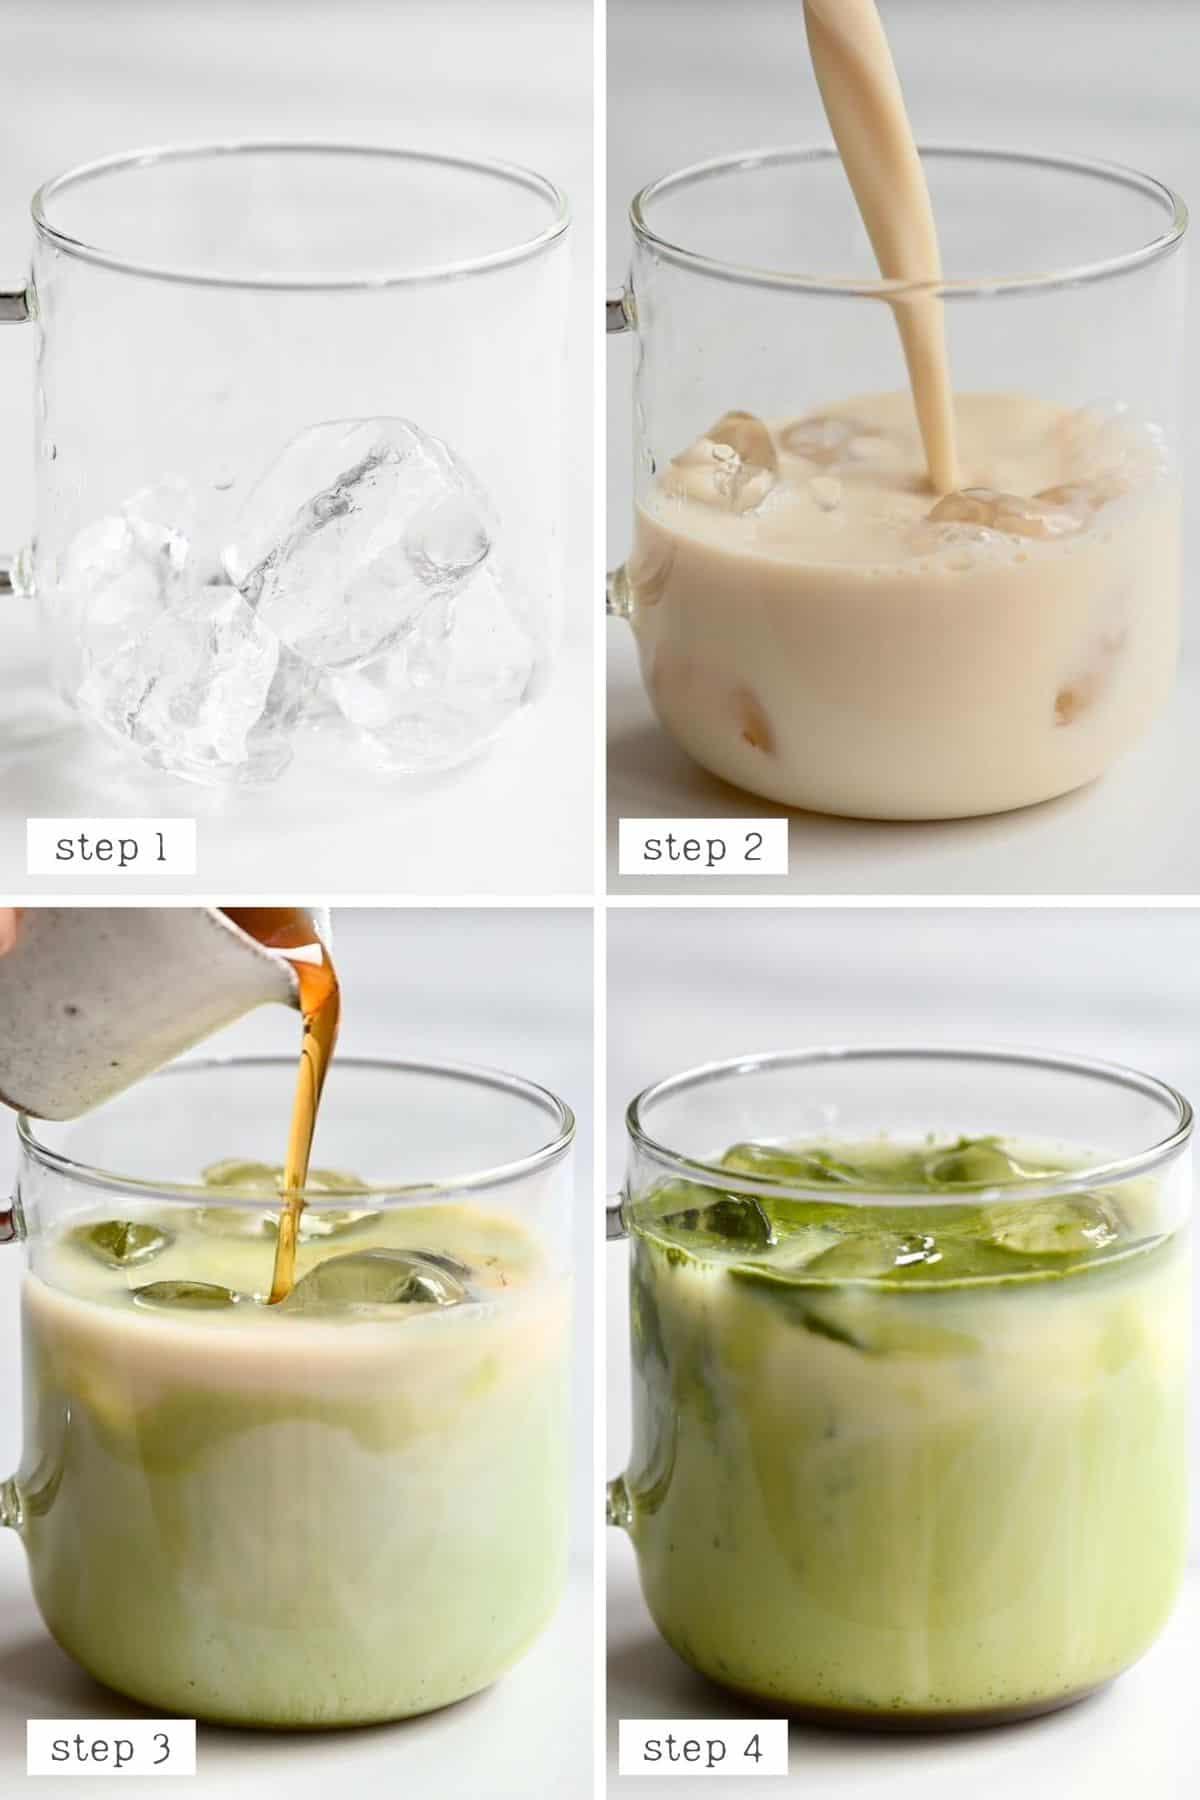 Steps for making iced matcha latte